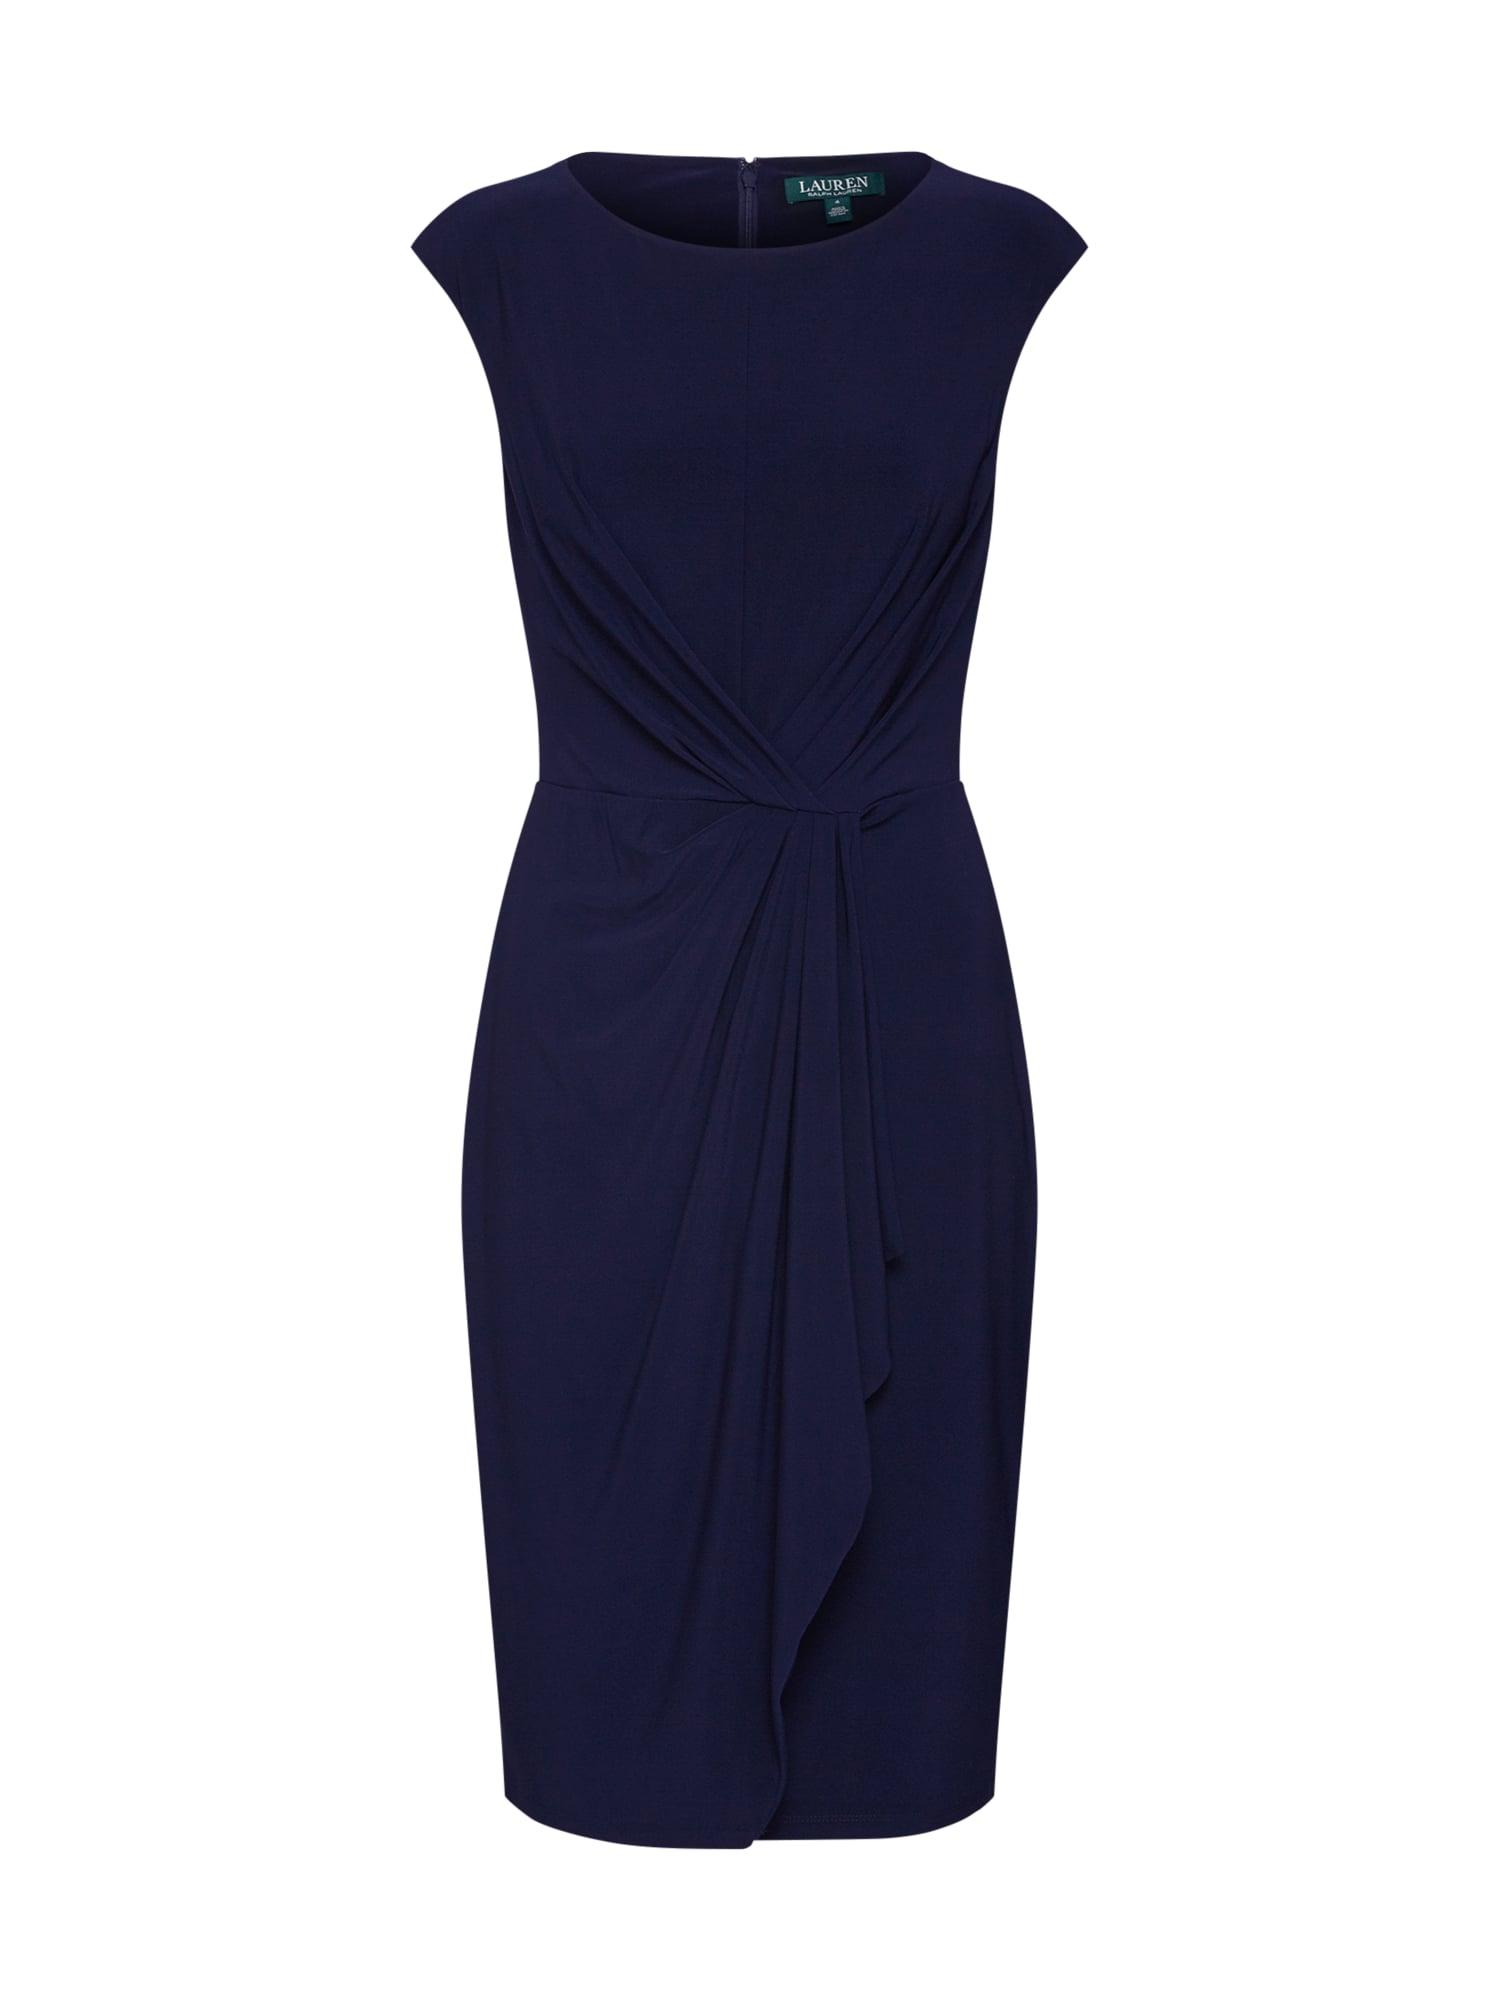 Pouzdrové šaty SVET námořnická modř Lauren Ralph Lauren